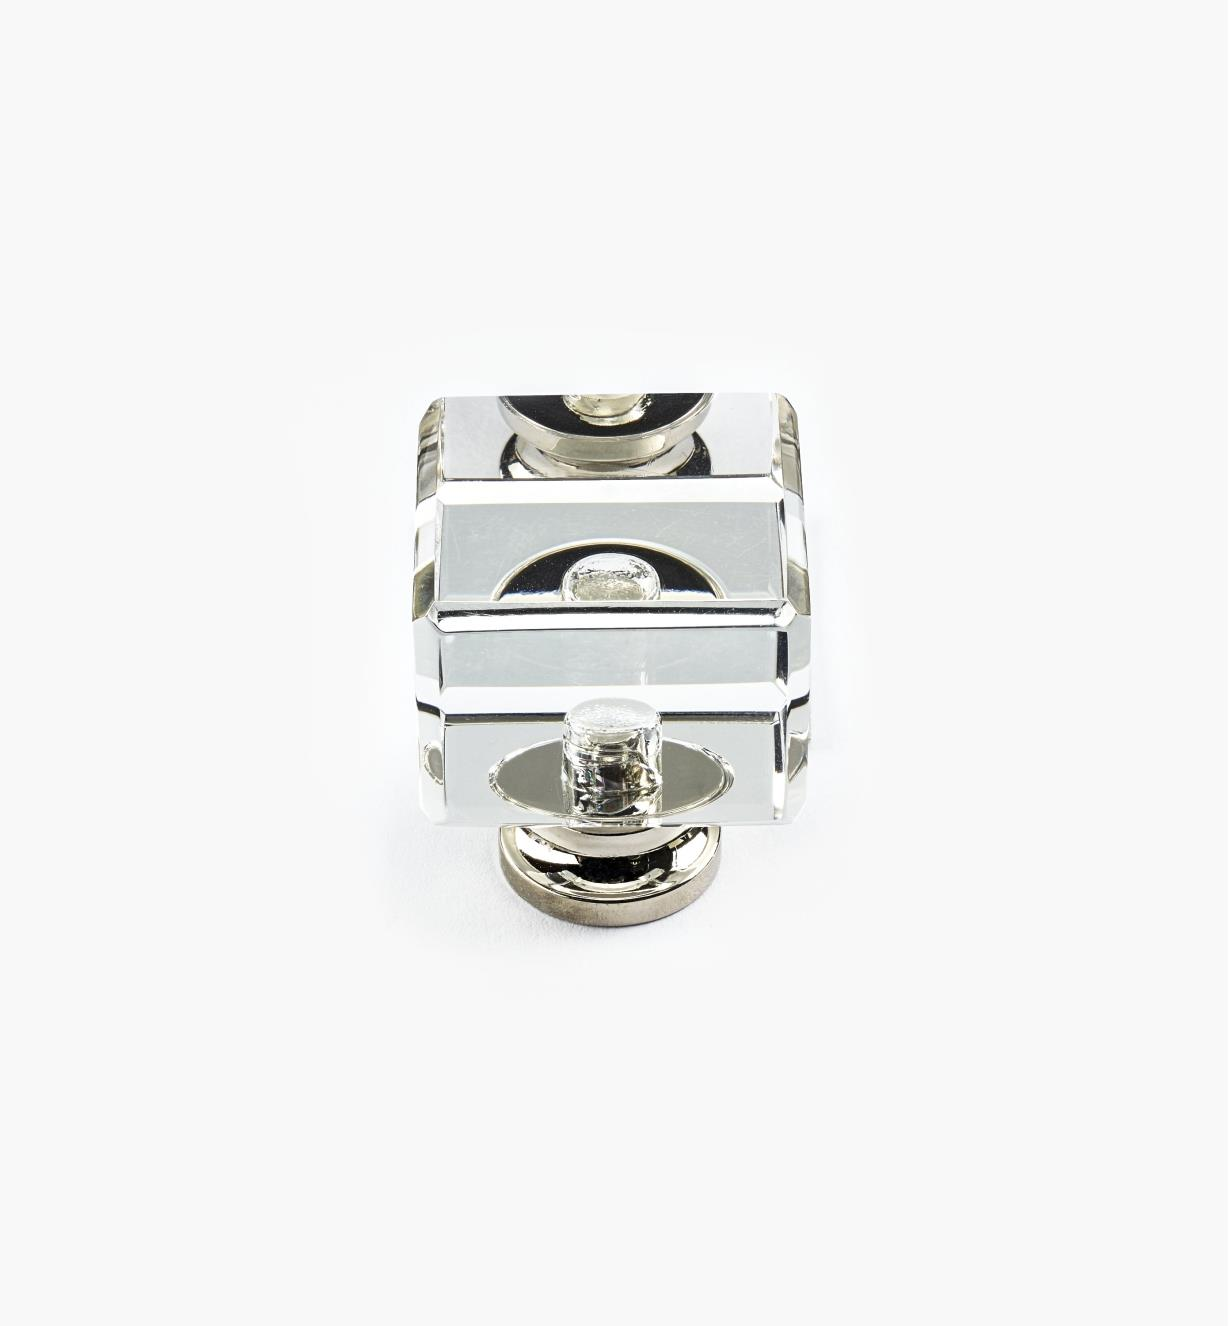 01A3855 - Glass Knob, Cube